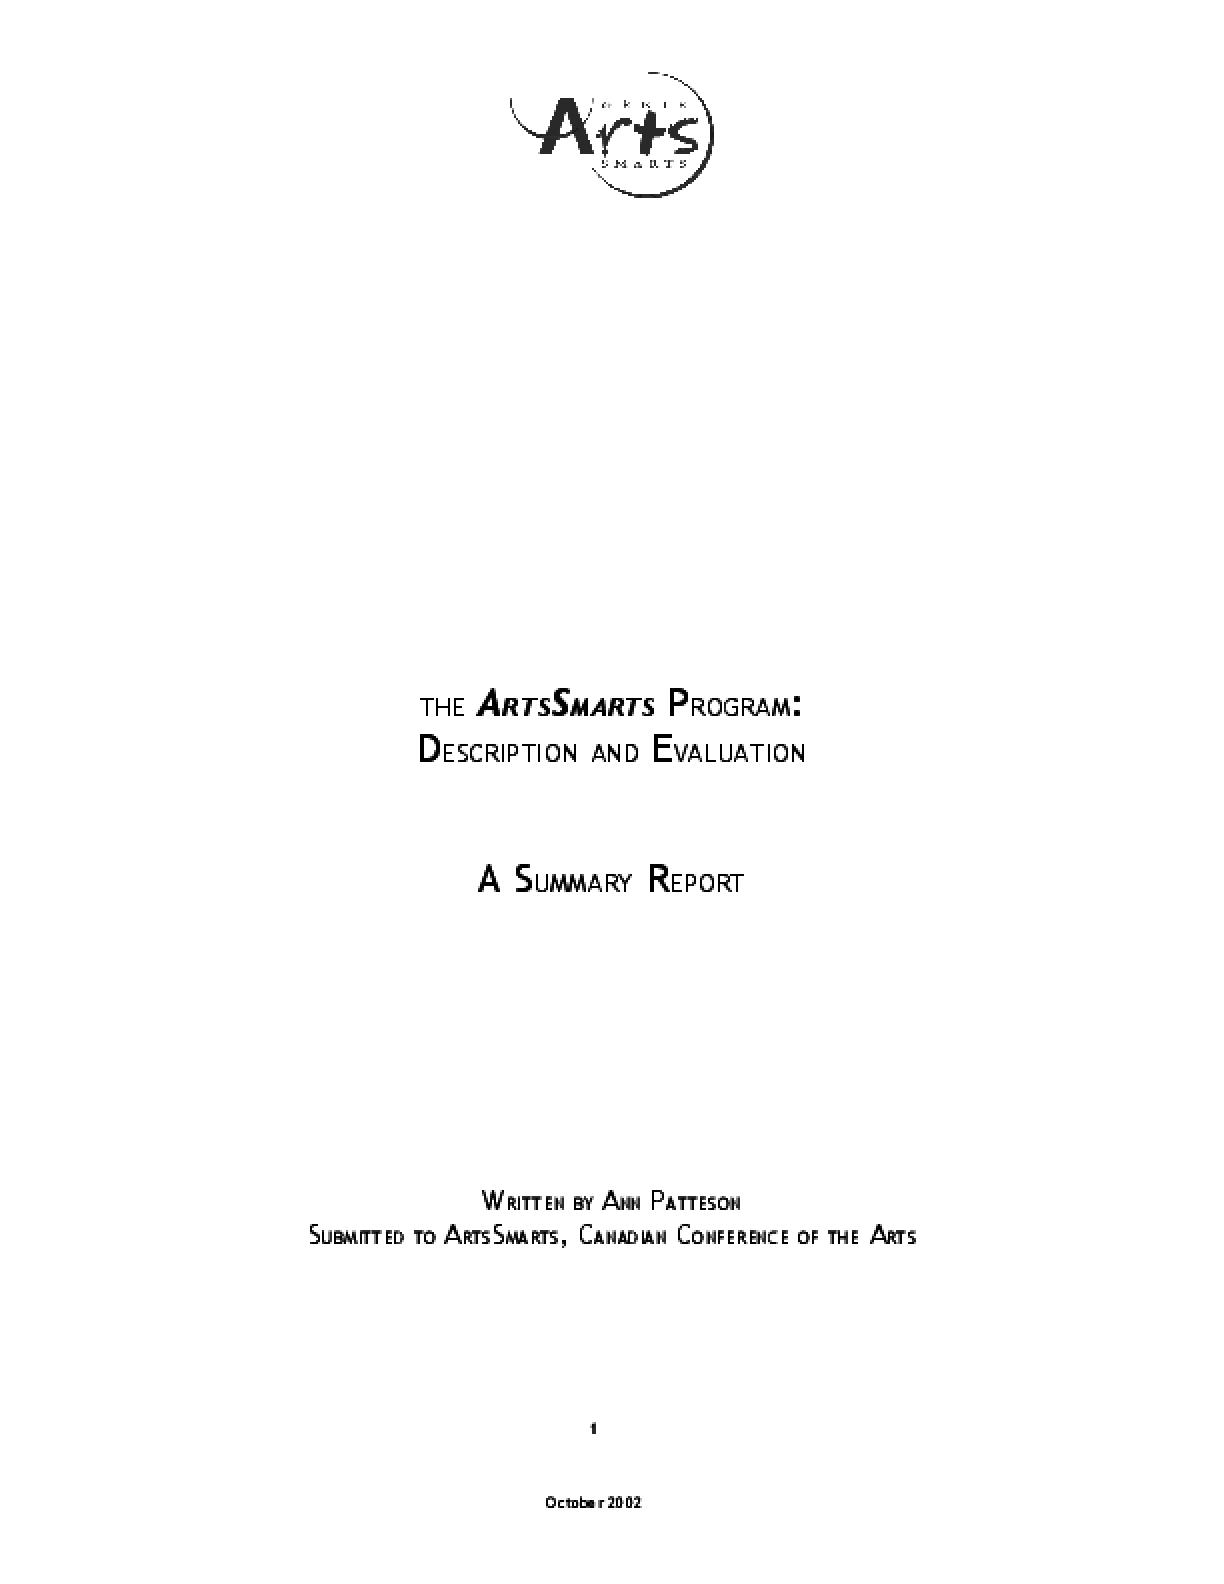 The ArtsSmarts Program: Description and Evaluation